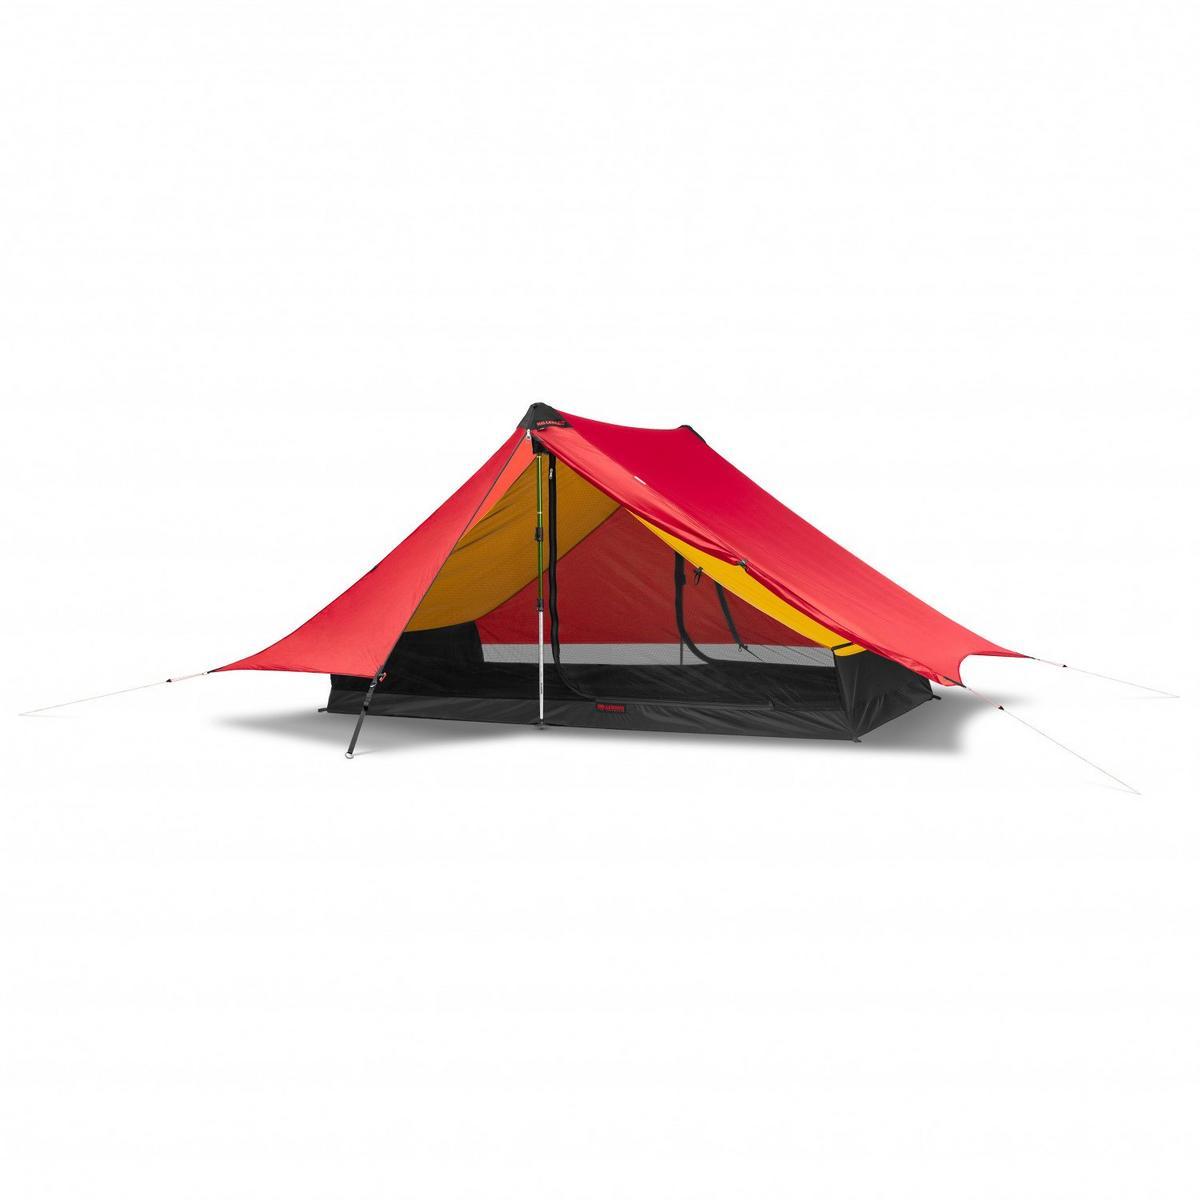 Hilleberg Anaris Tent - Red